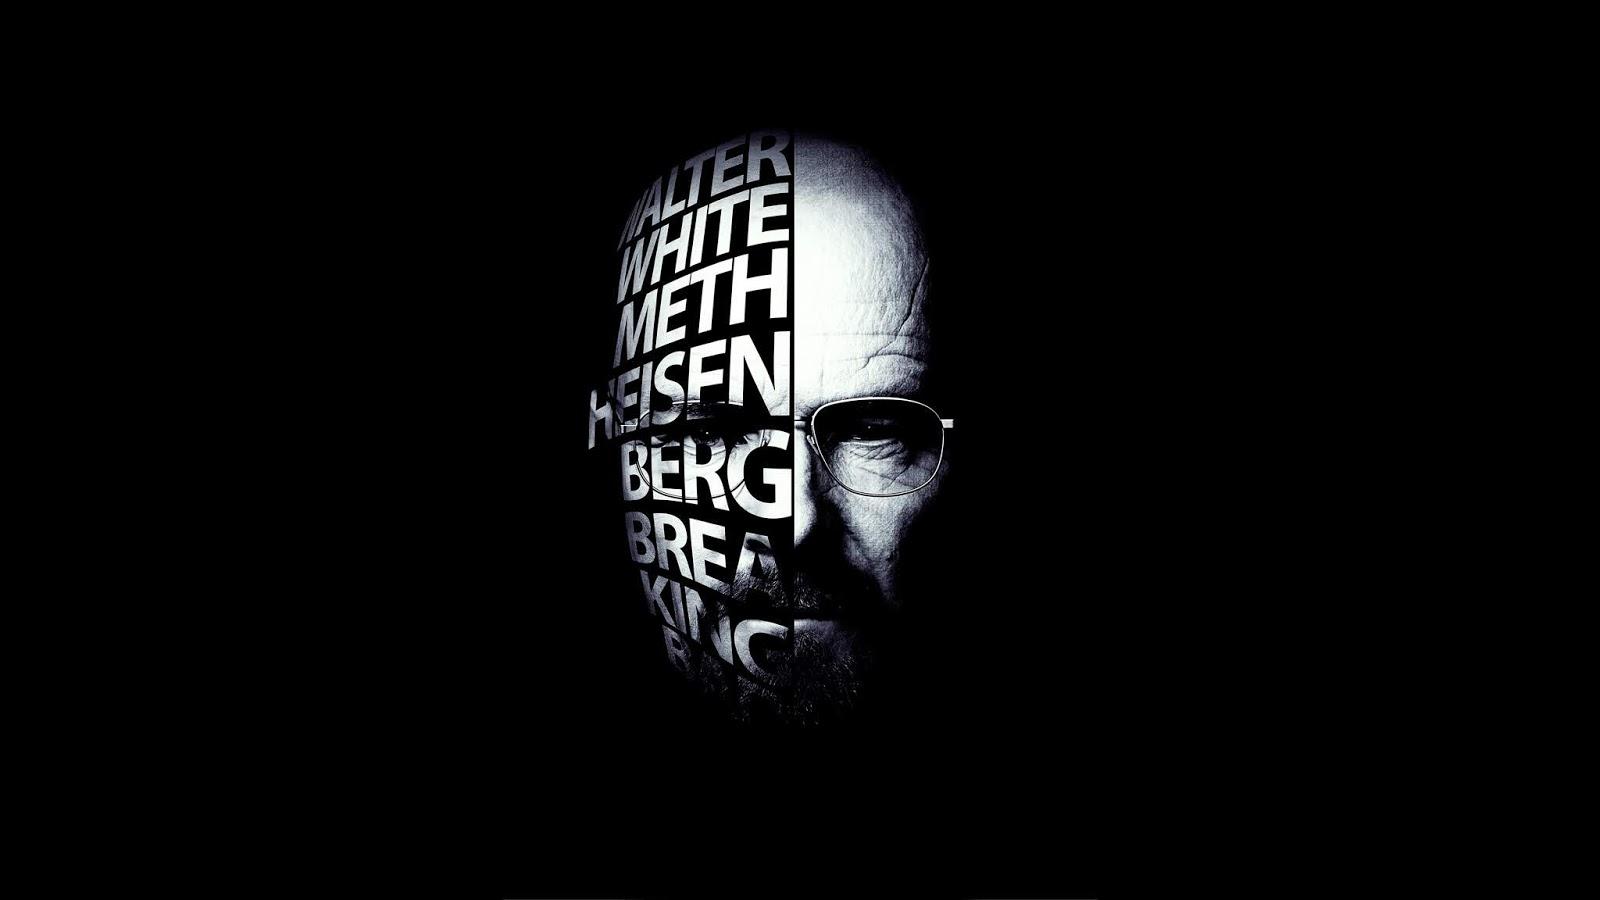 Breaking Bad, Bryan Cranston, Walter White, Heisenberg, 4K, Typography